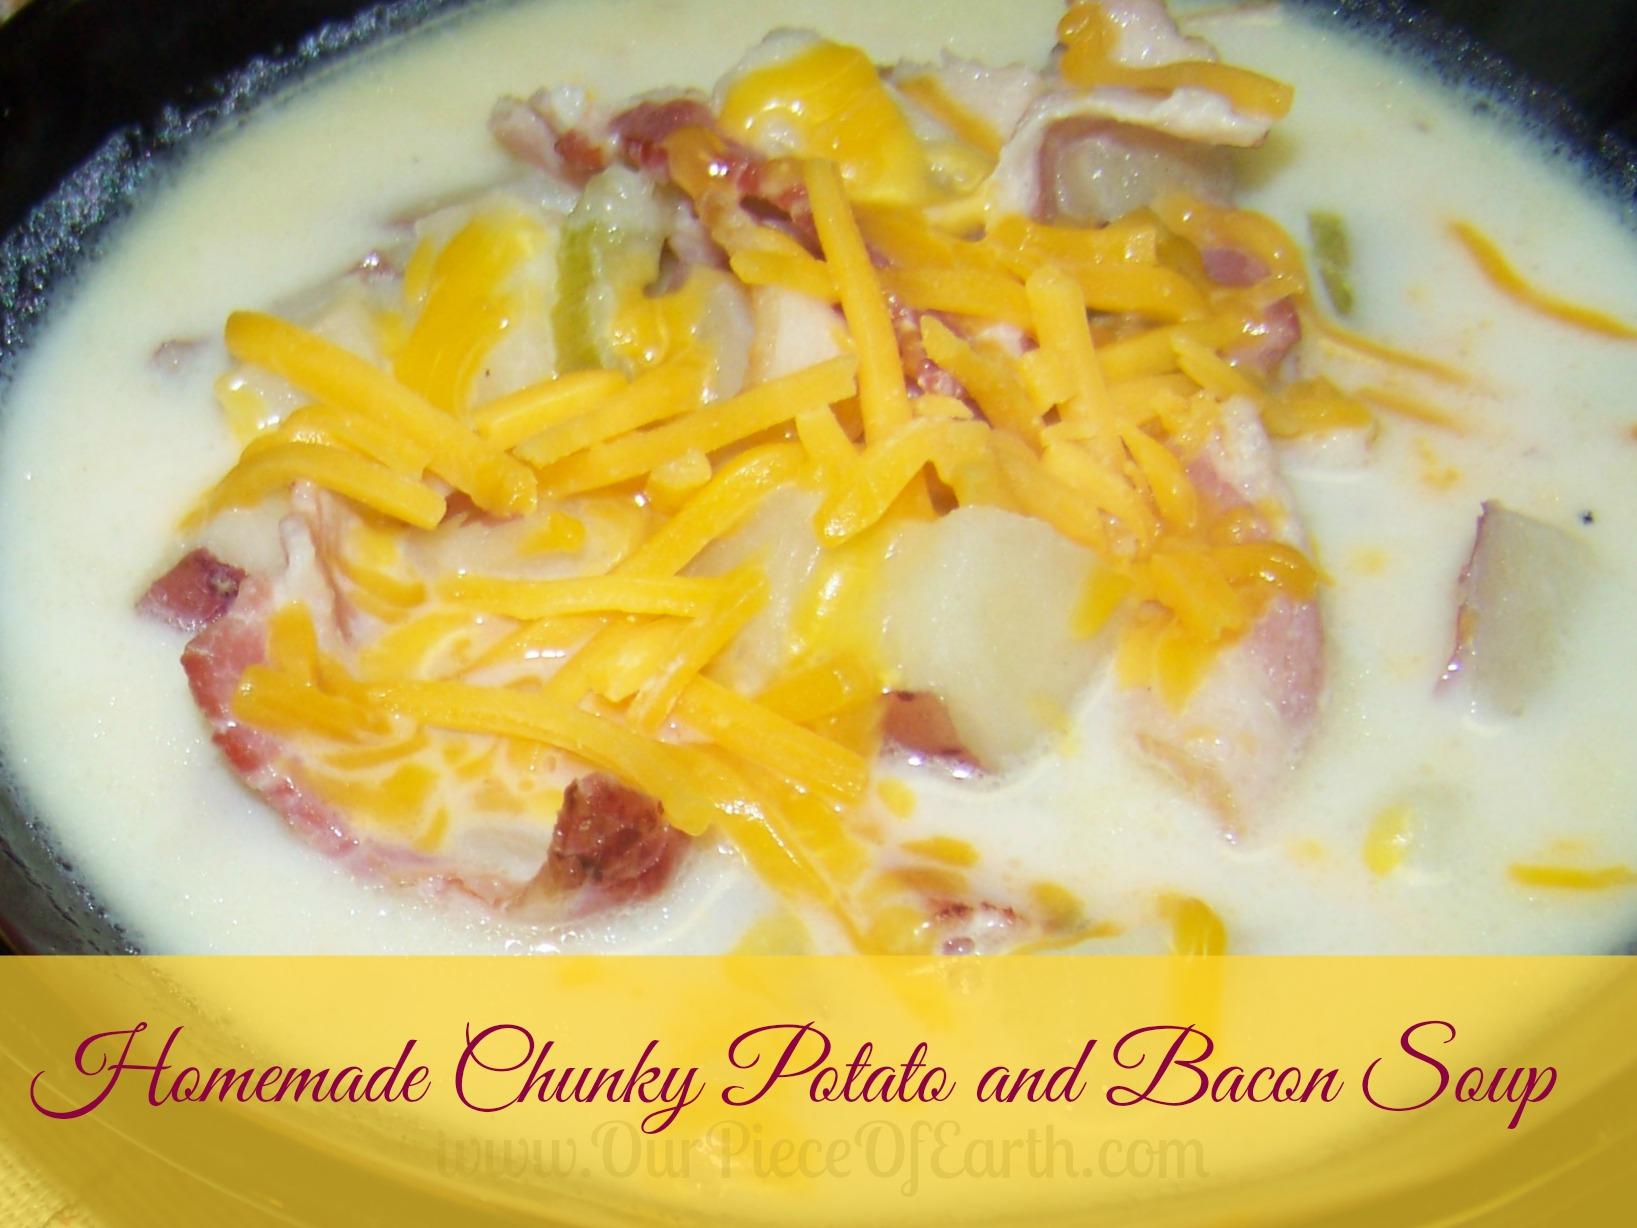 Homemade Chunky Potato Soup